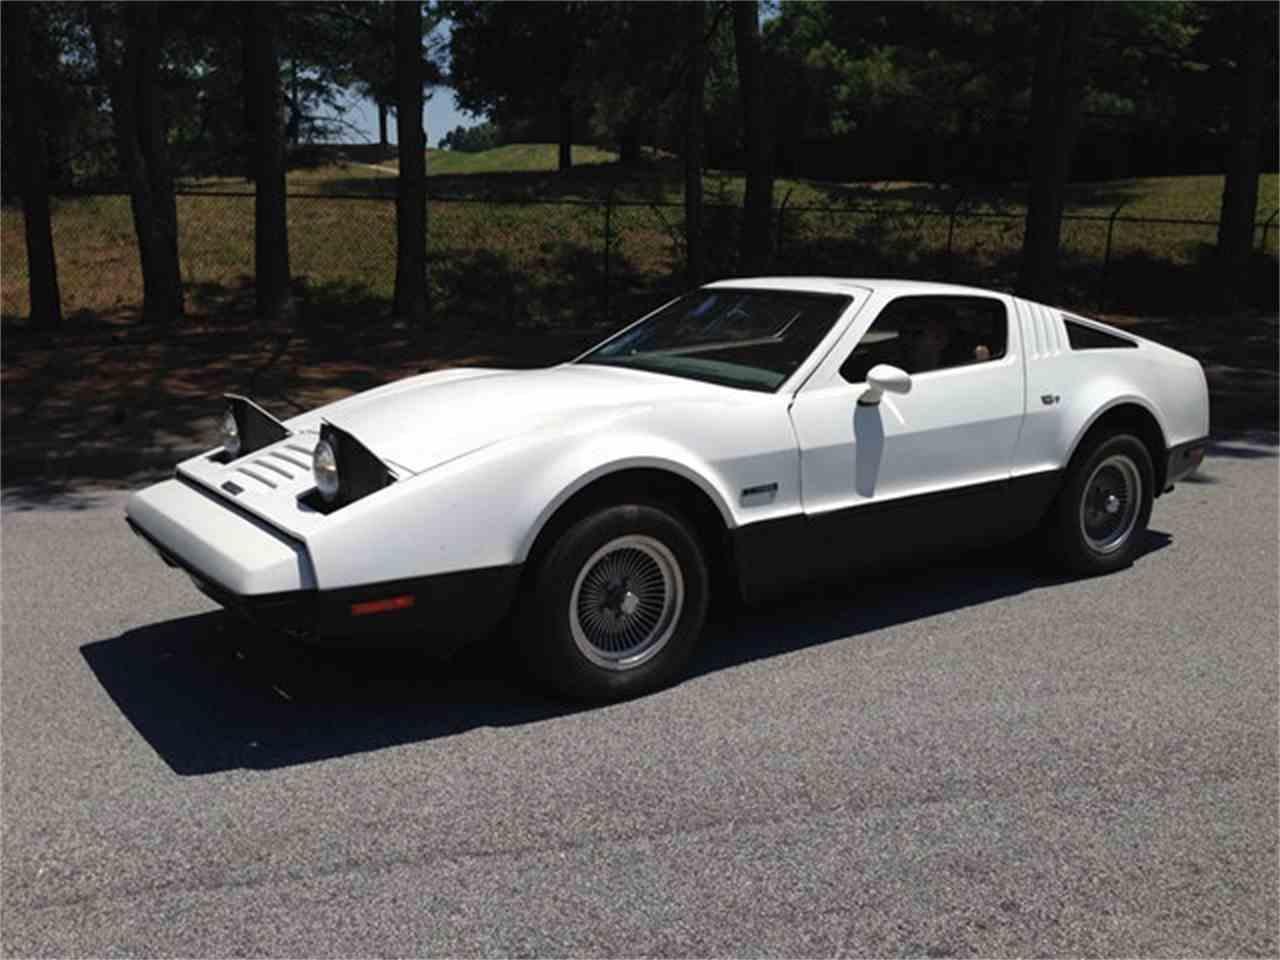 Classic Bricklin for Sale on ClassicCars.com